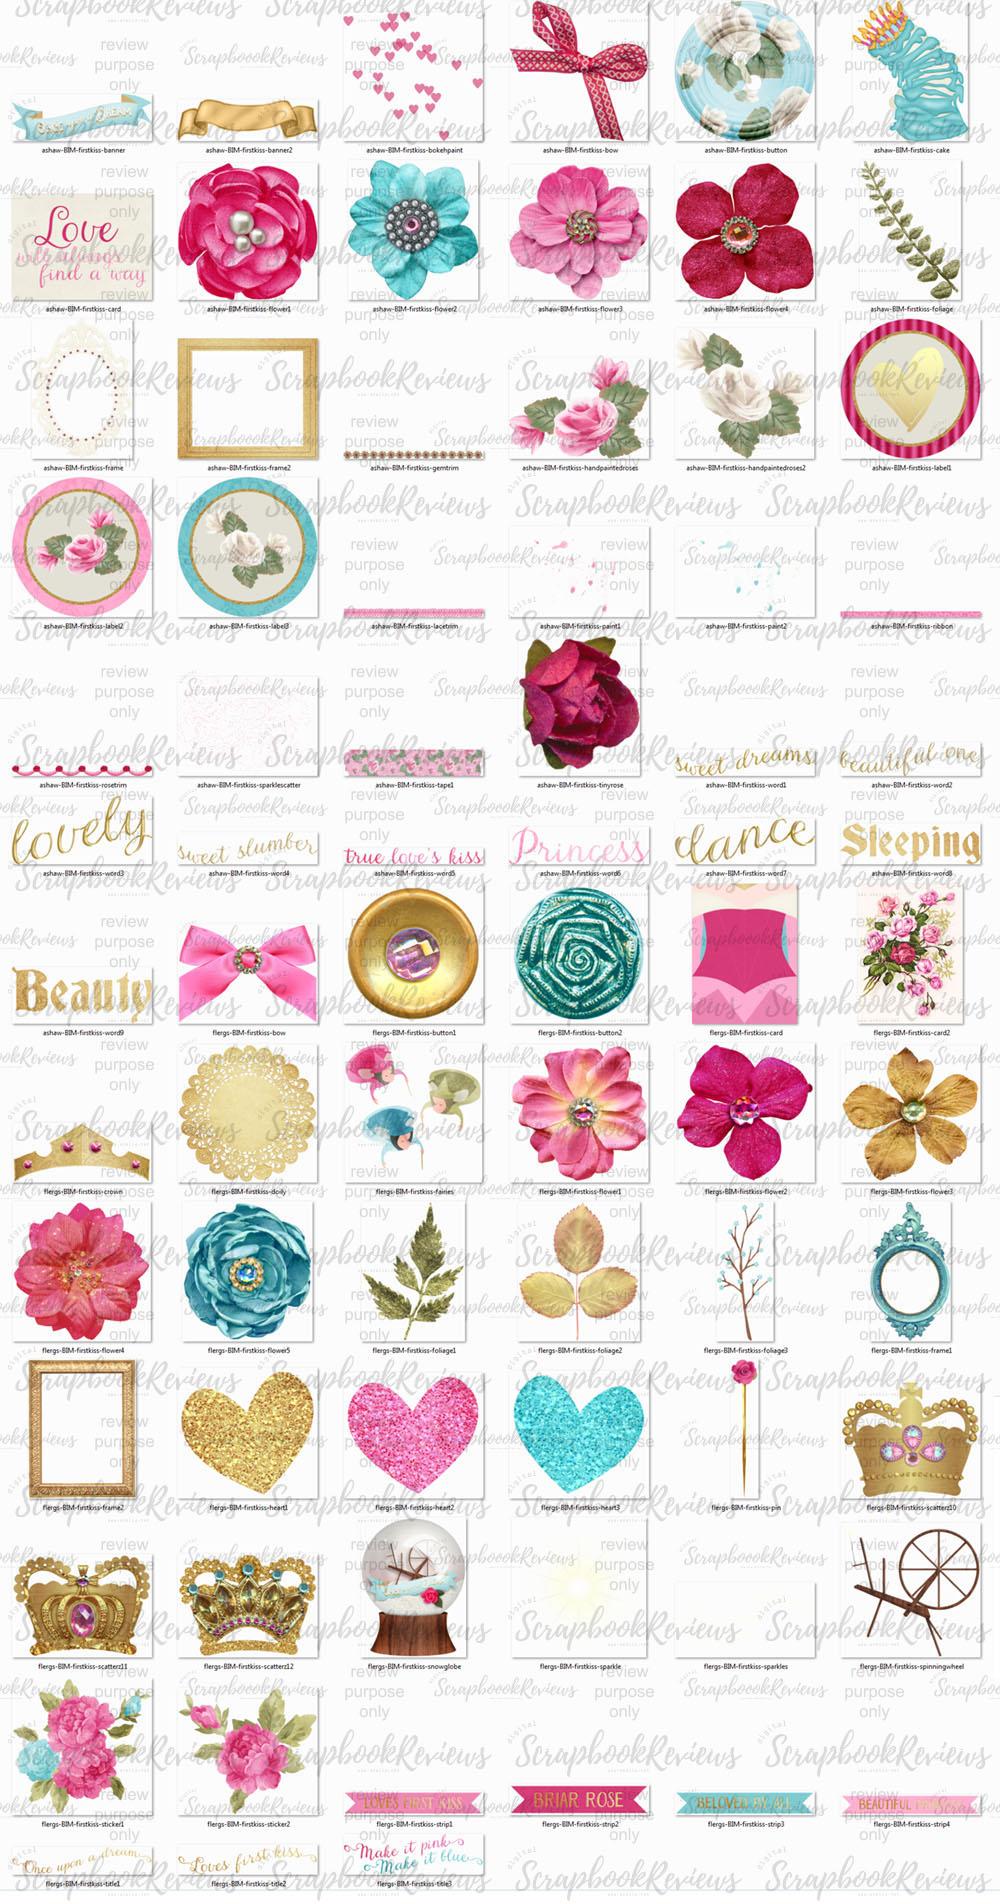 75 sleeping beauty themed digital scrapbook elements